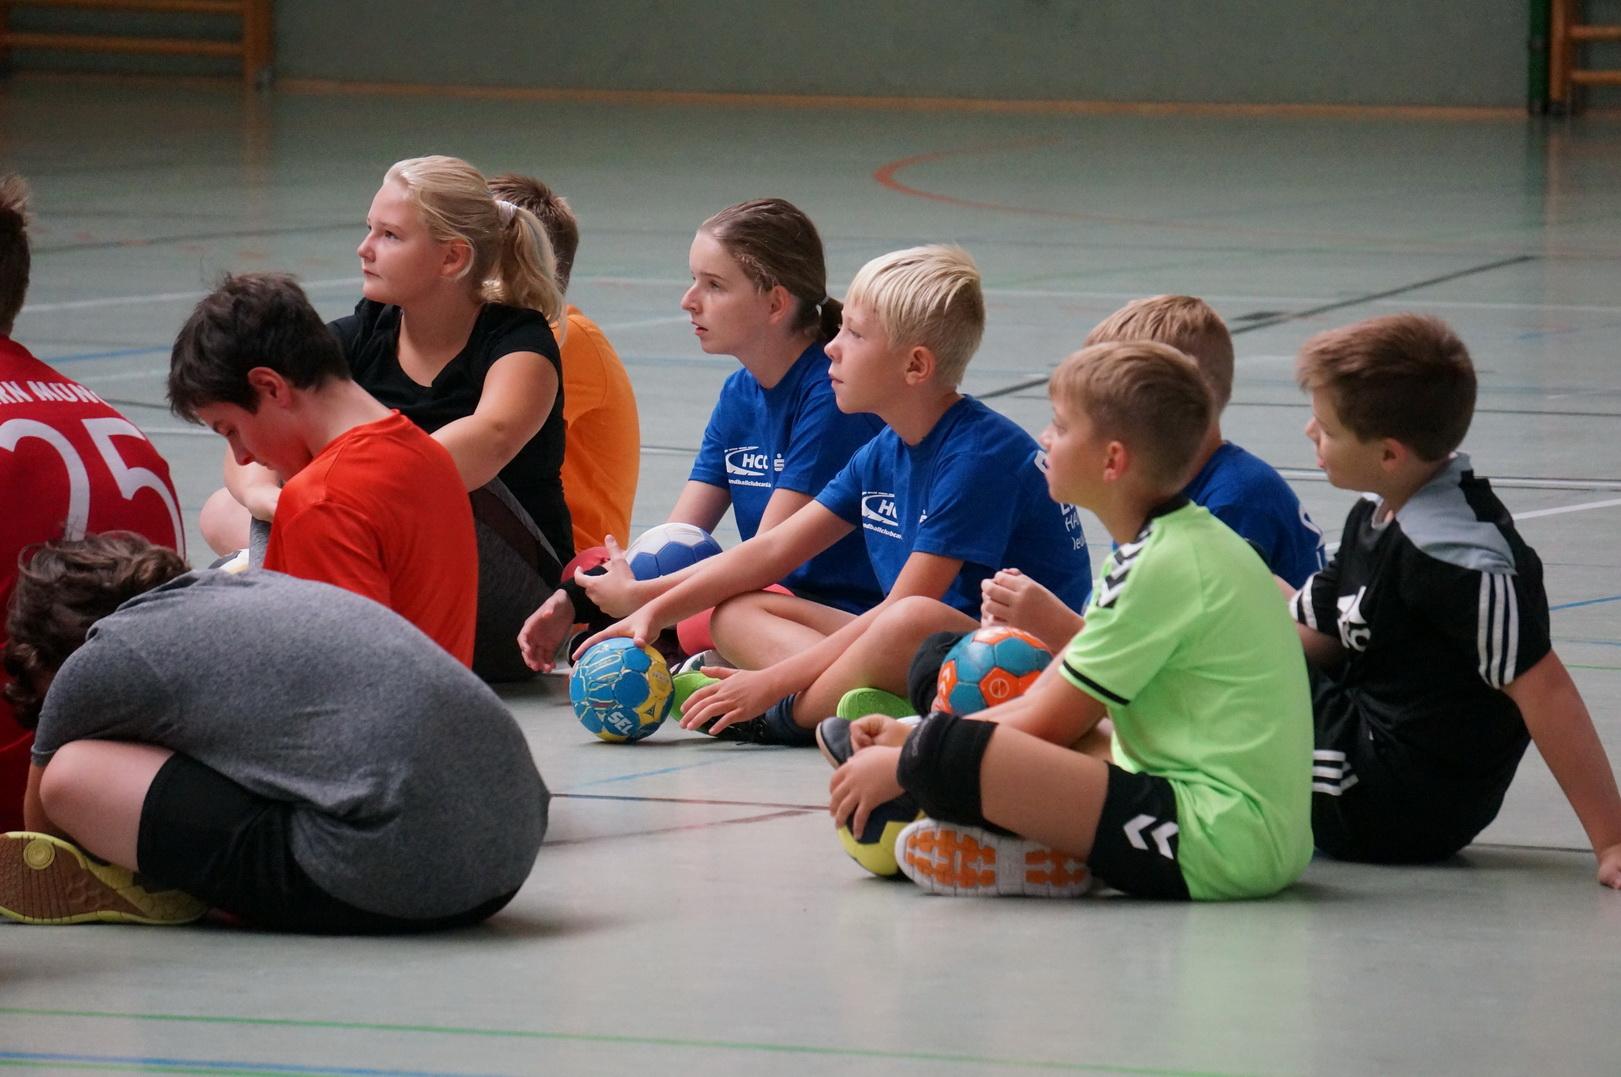 201808_Handballcamp_SDH_MG_140w